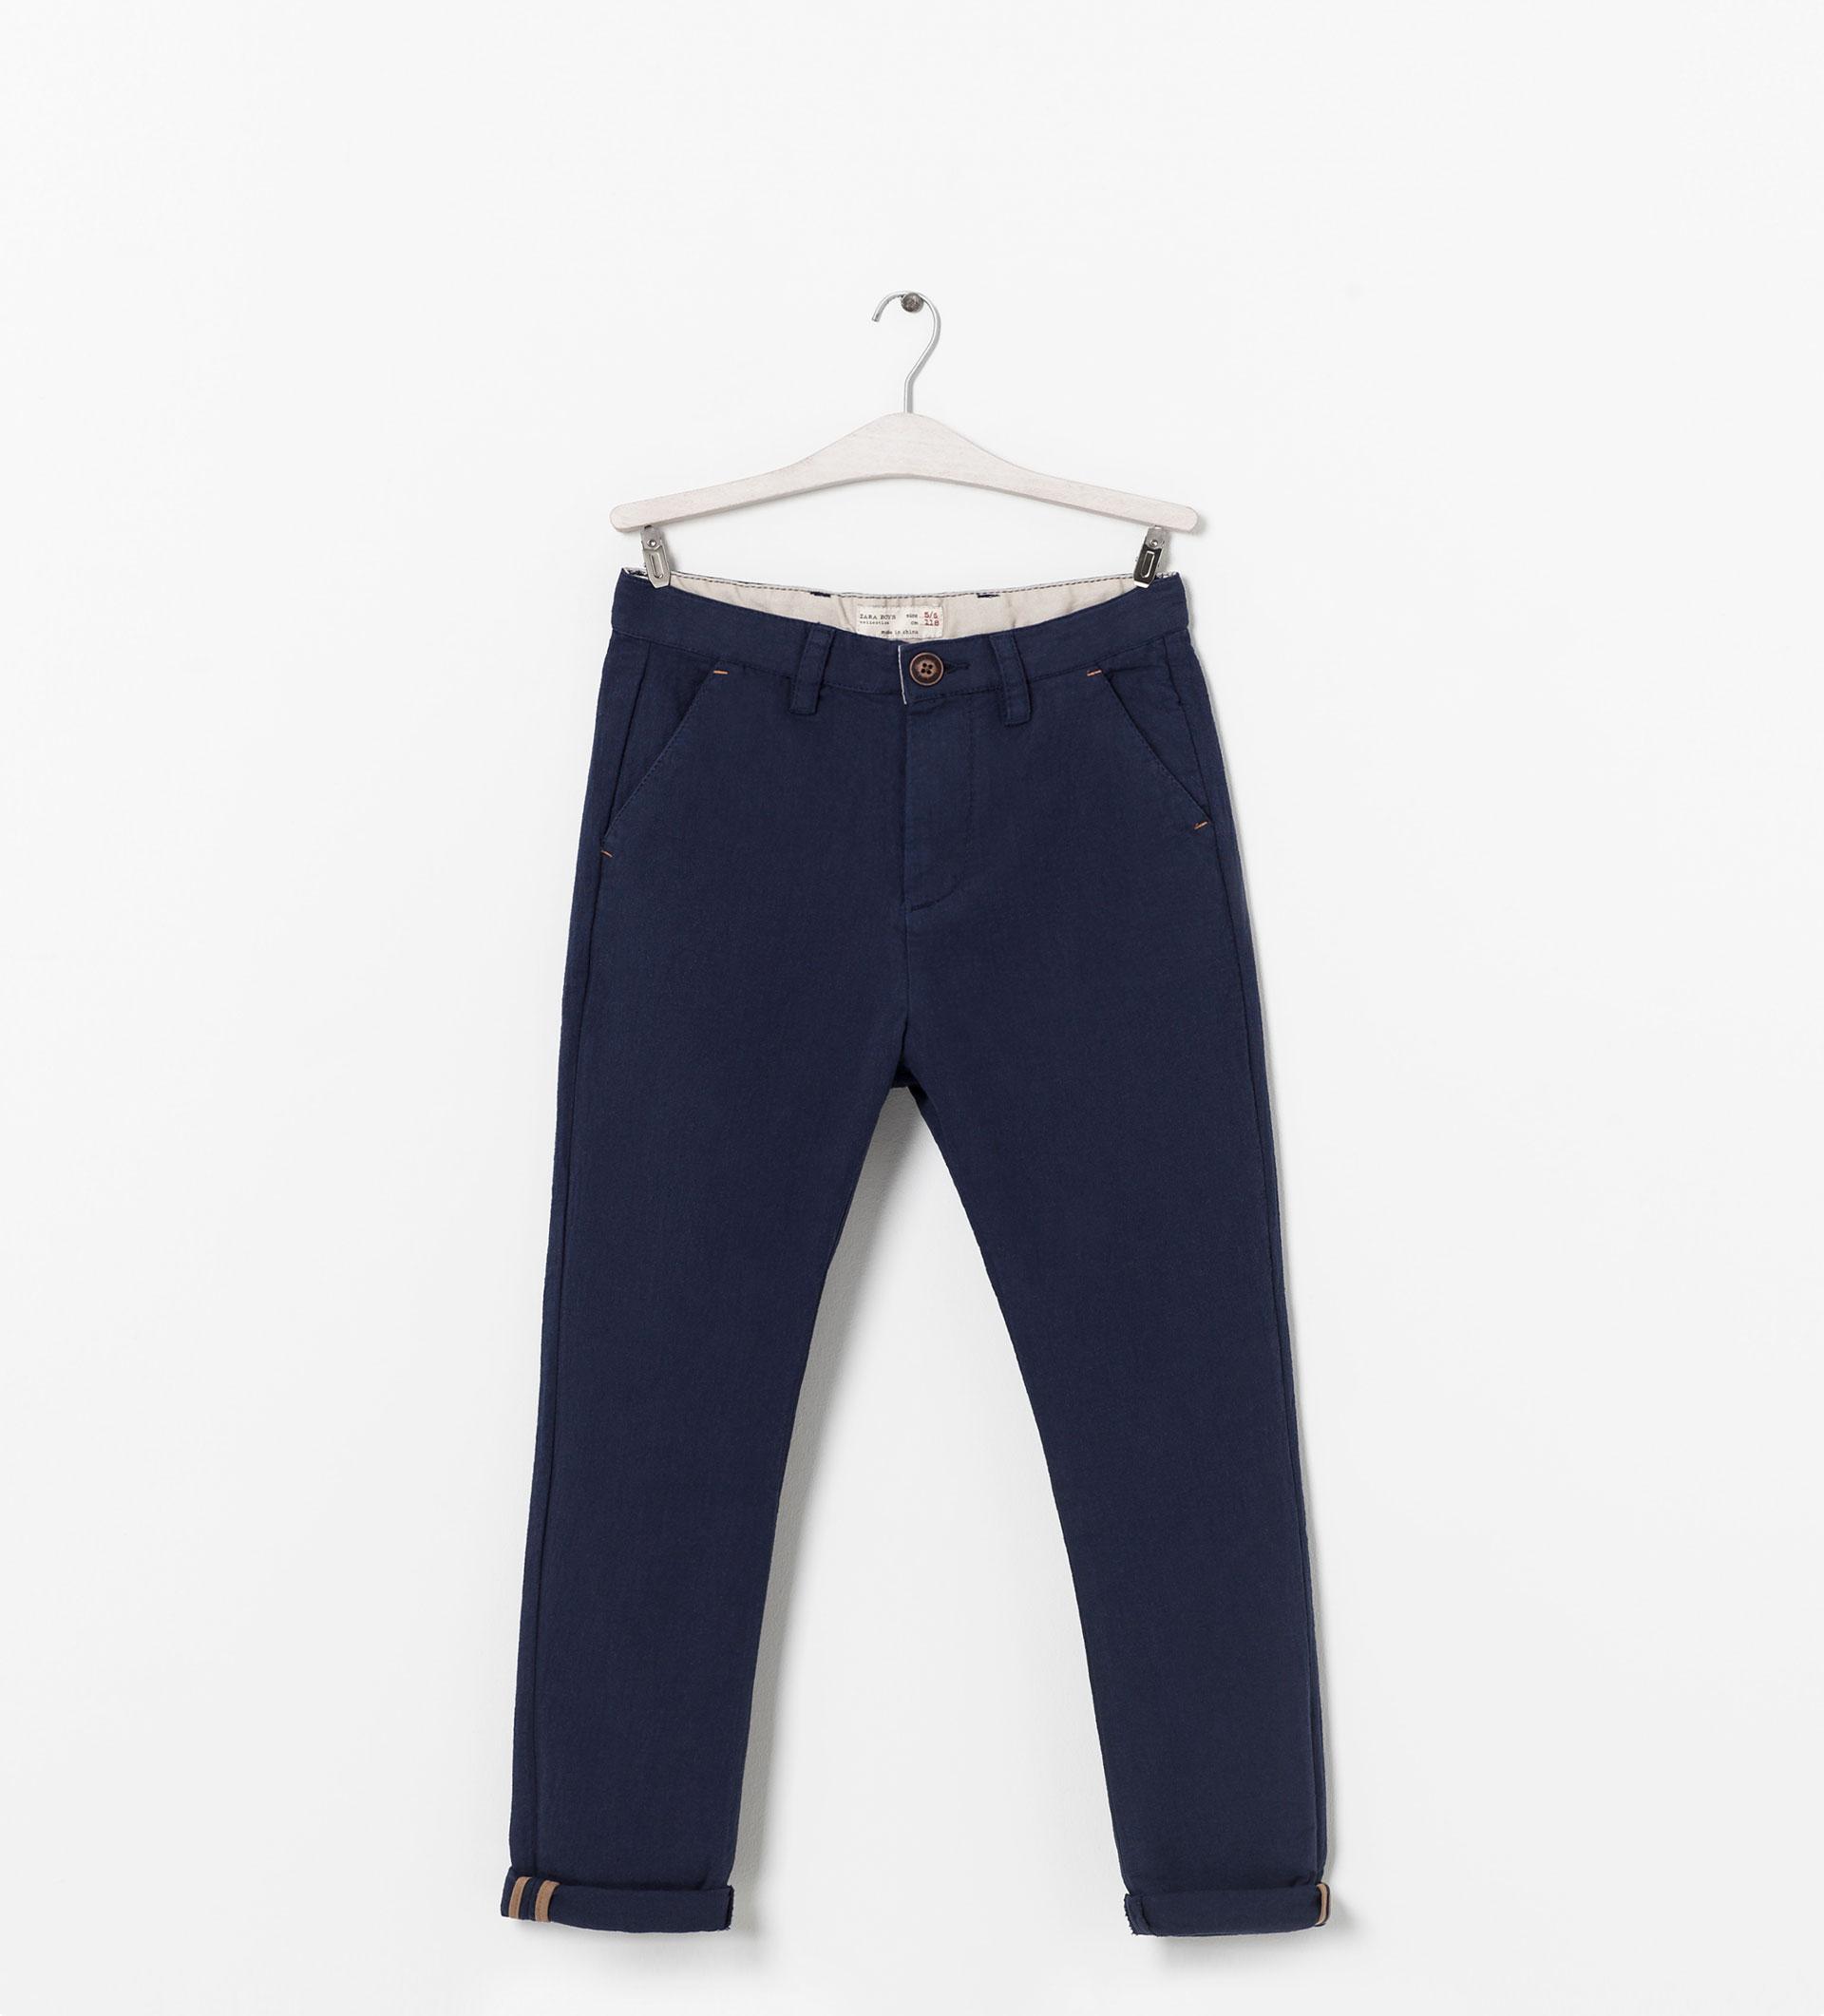 Designer Underwear Wholesalers Uk